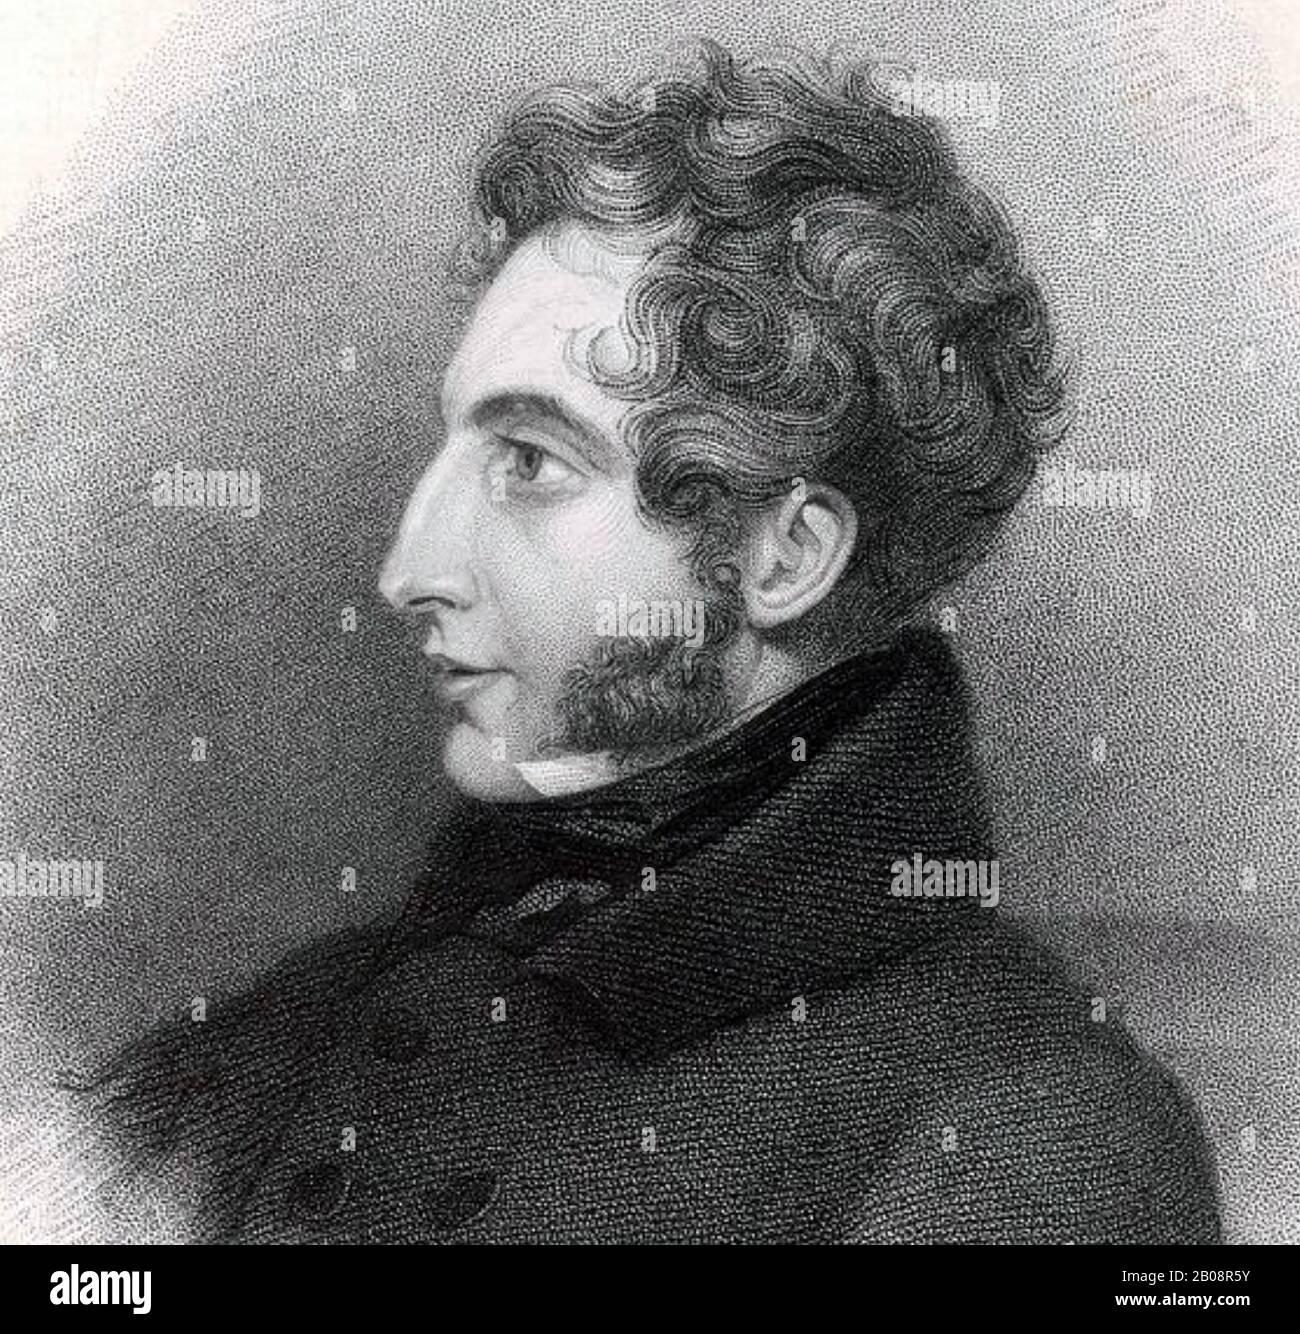 EDWARD BULWER-LYTTON (1803-1873) English writer and Conservative ...